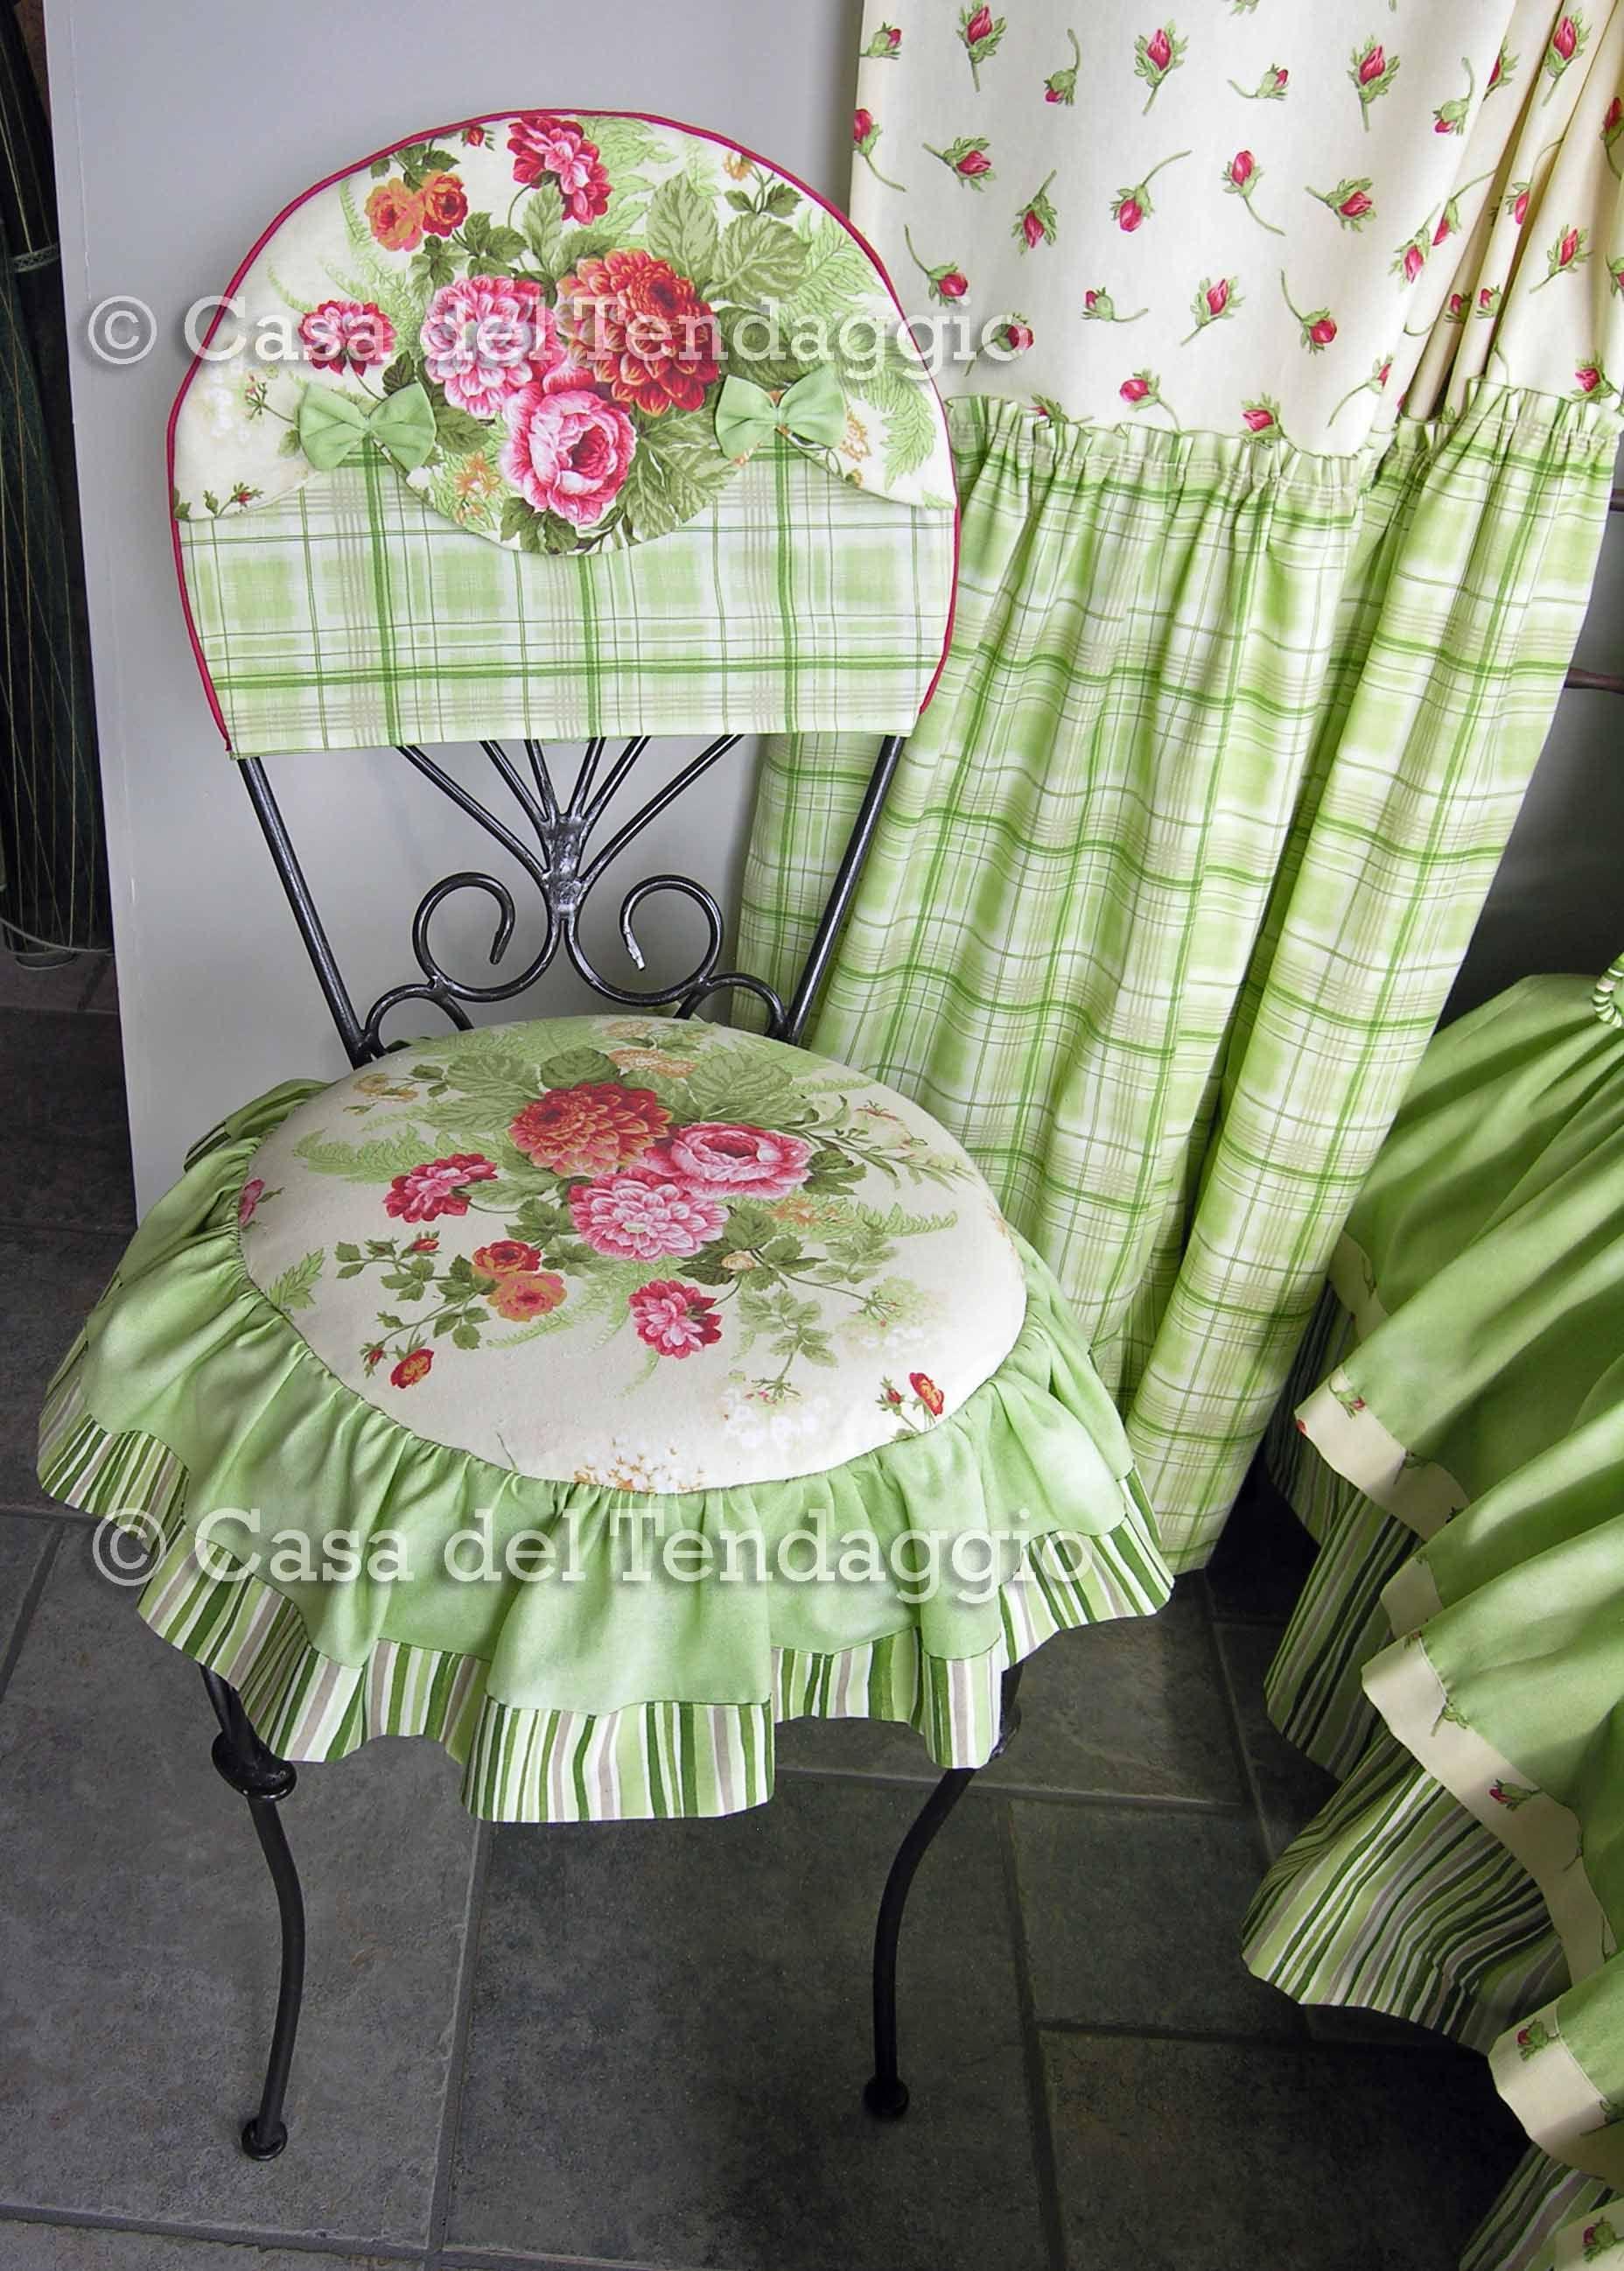 christmas chair covers pinterest mustard yellow cuscino per sedia con tessuto country a fiori shabby